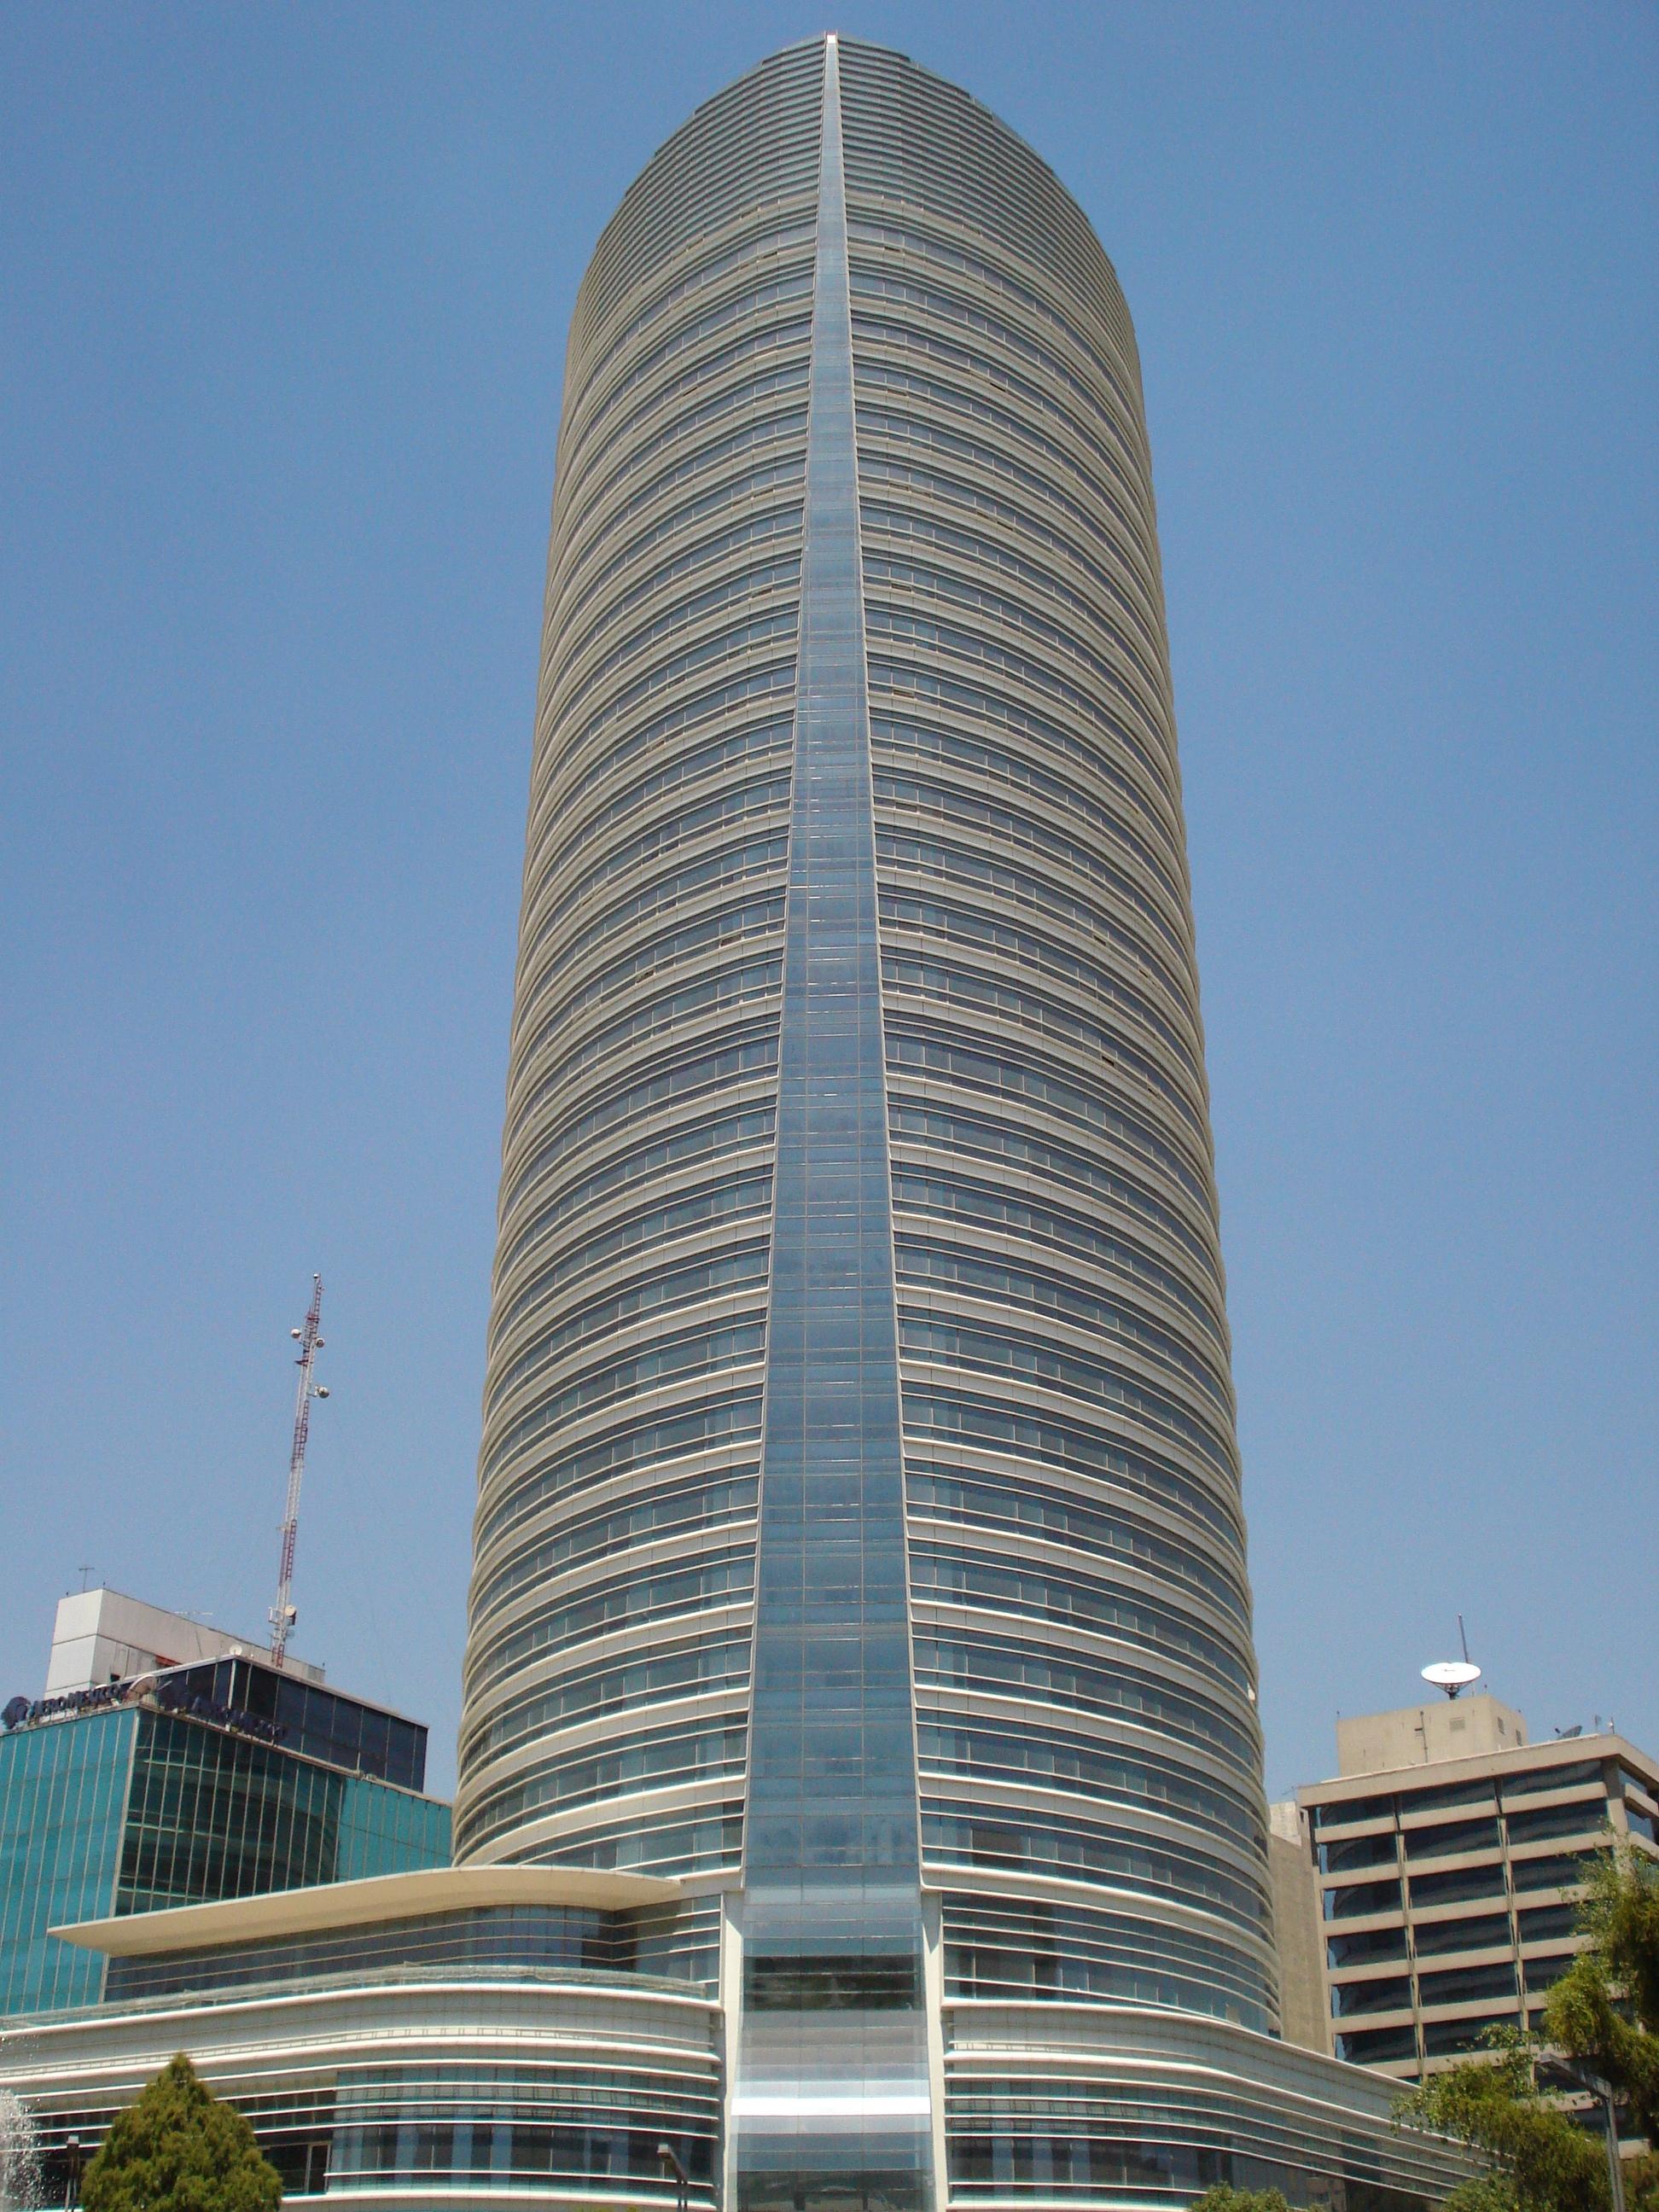 File:Torre Libertad, St Regis Ciudad de Mexico.JPG ... - photo#15